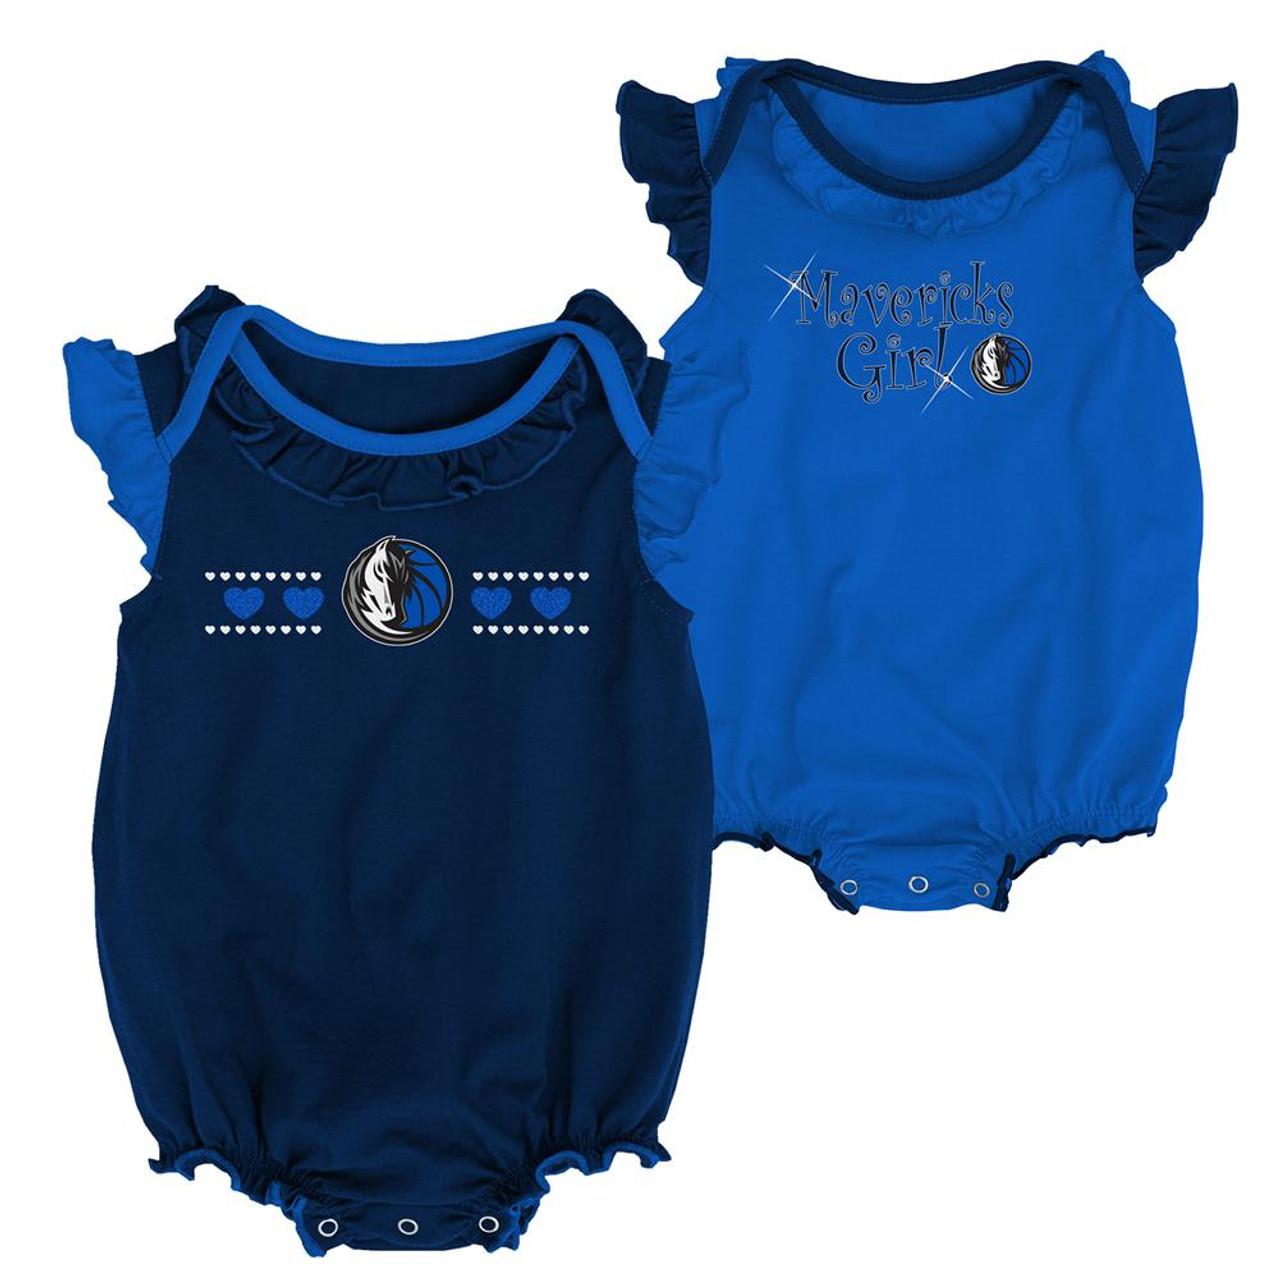 Dallas Mavericks Creeper 2 Pack Homecoming Bodysuit Set